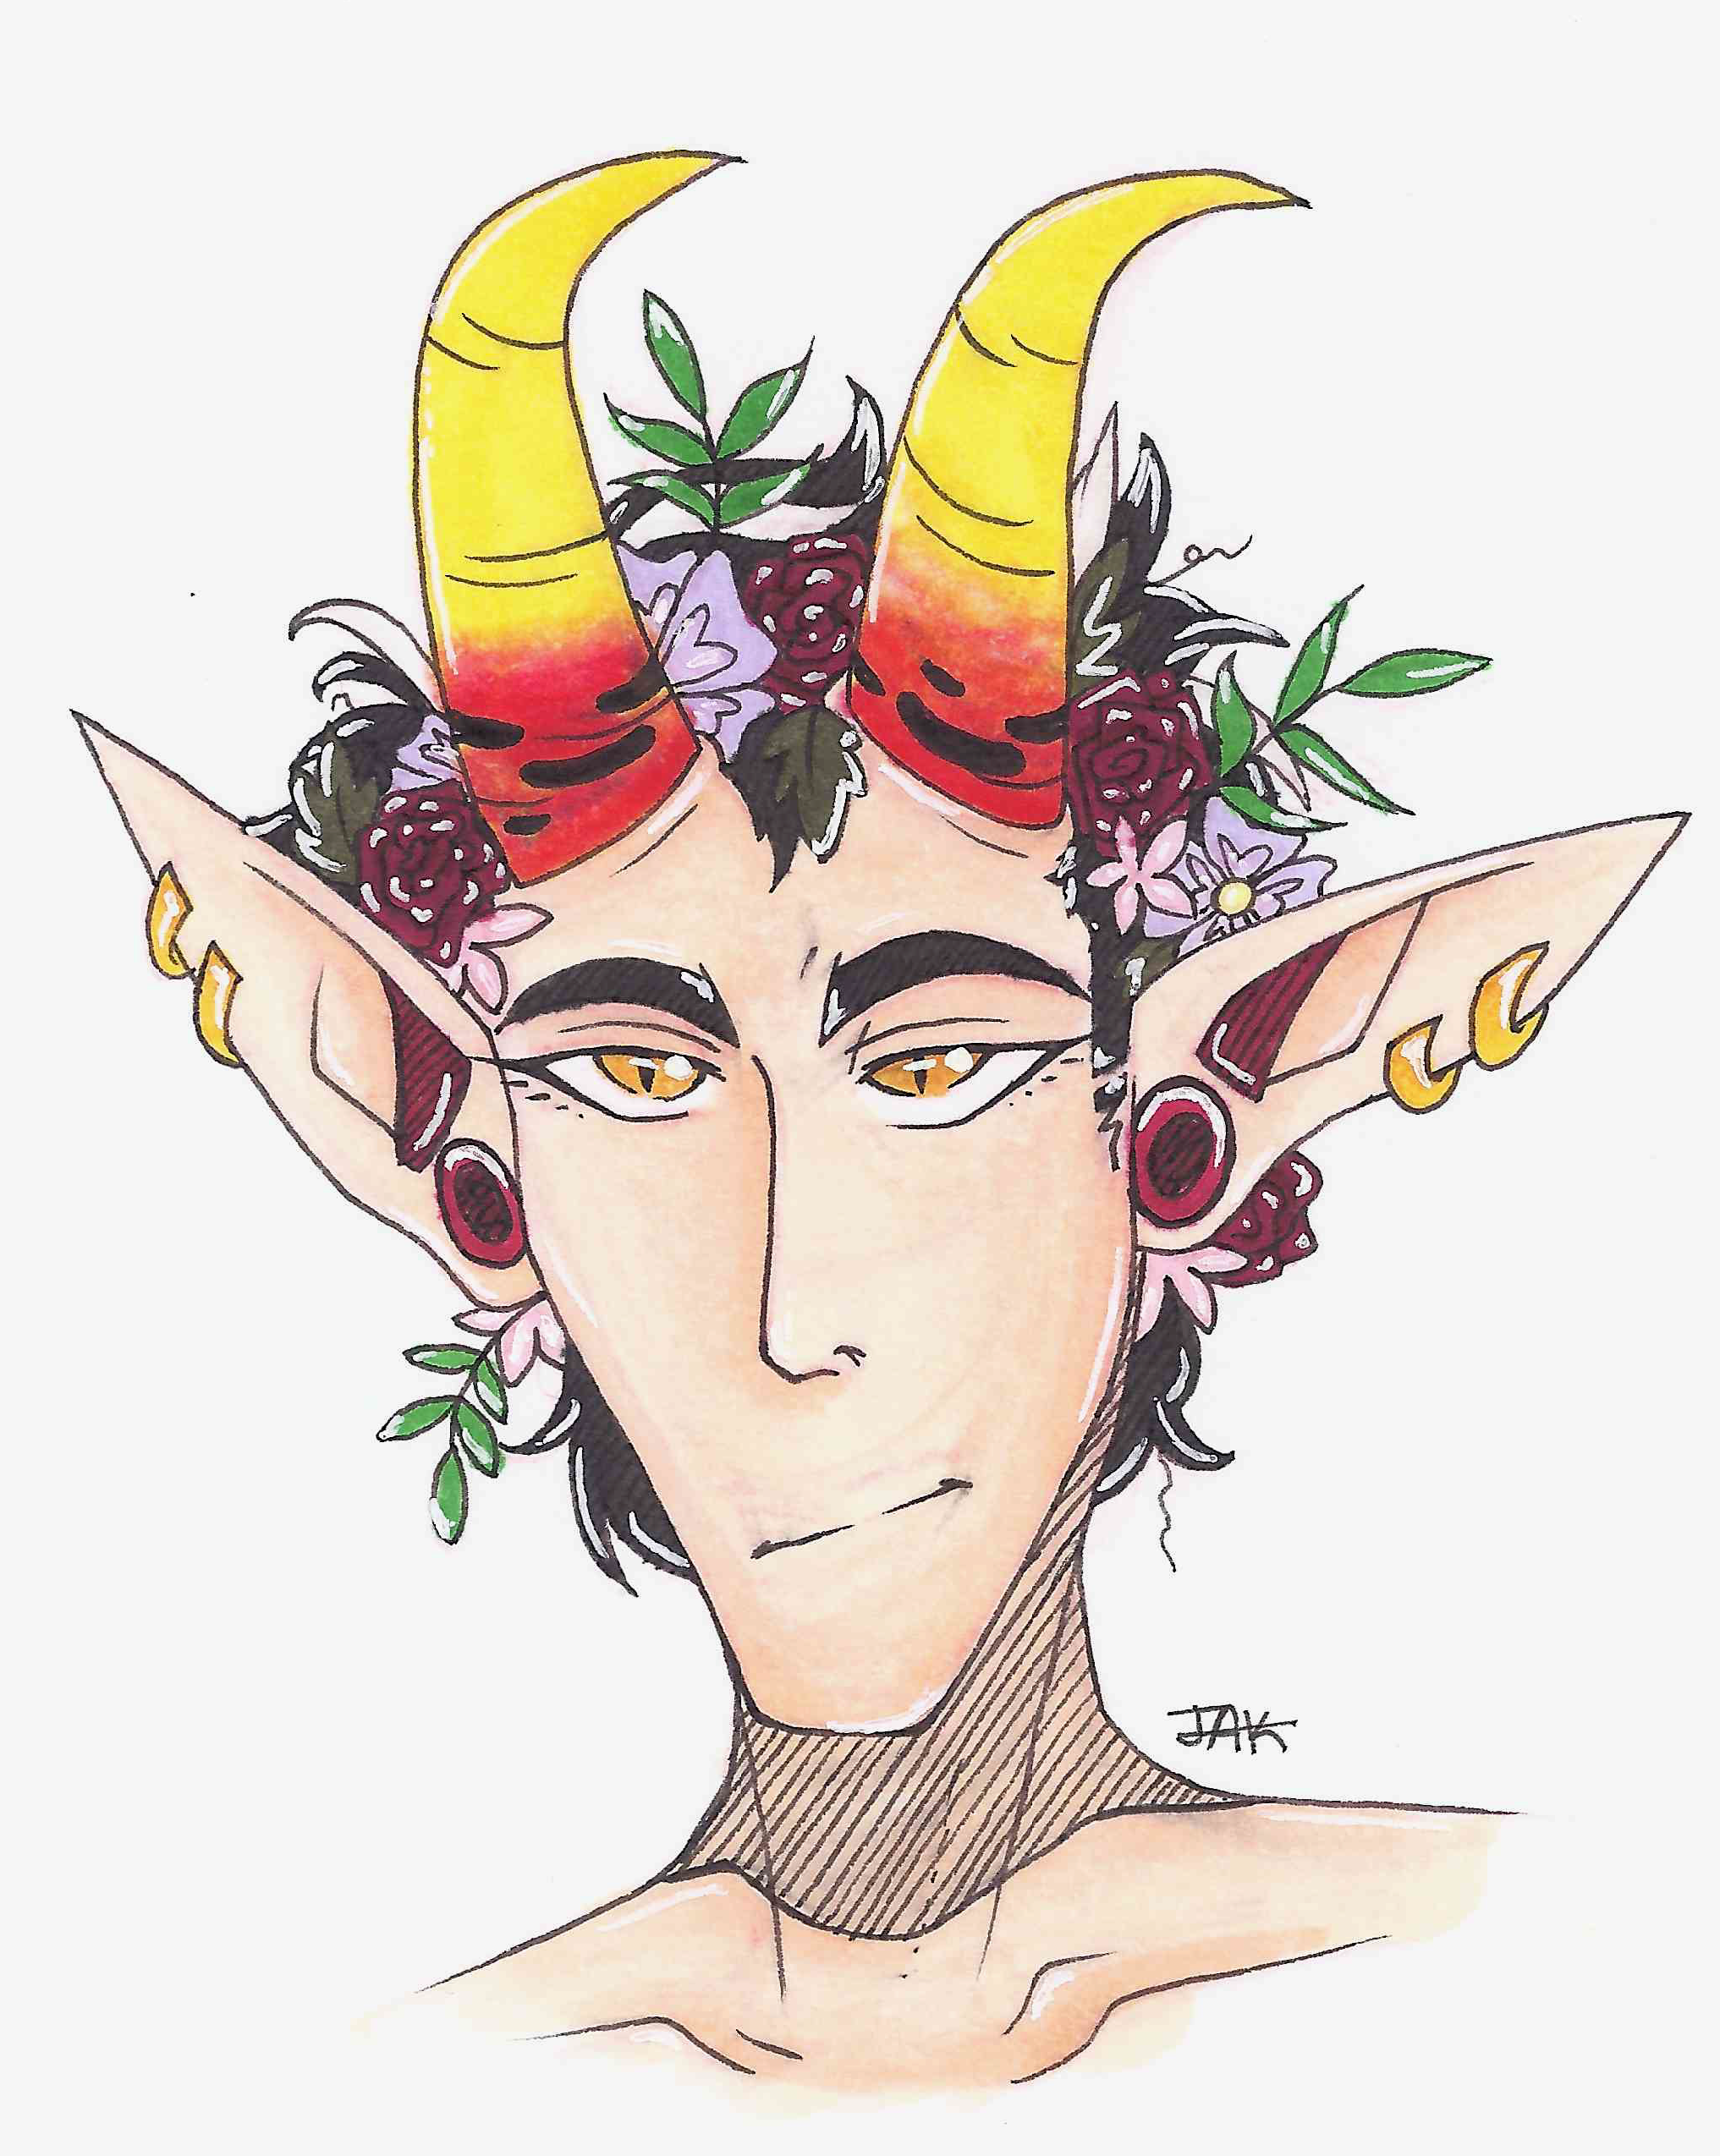 Deviantart Flower Crown Satan In A Flower Crown By Jak Dhcnc